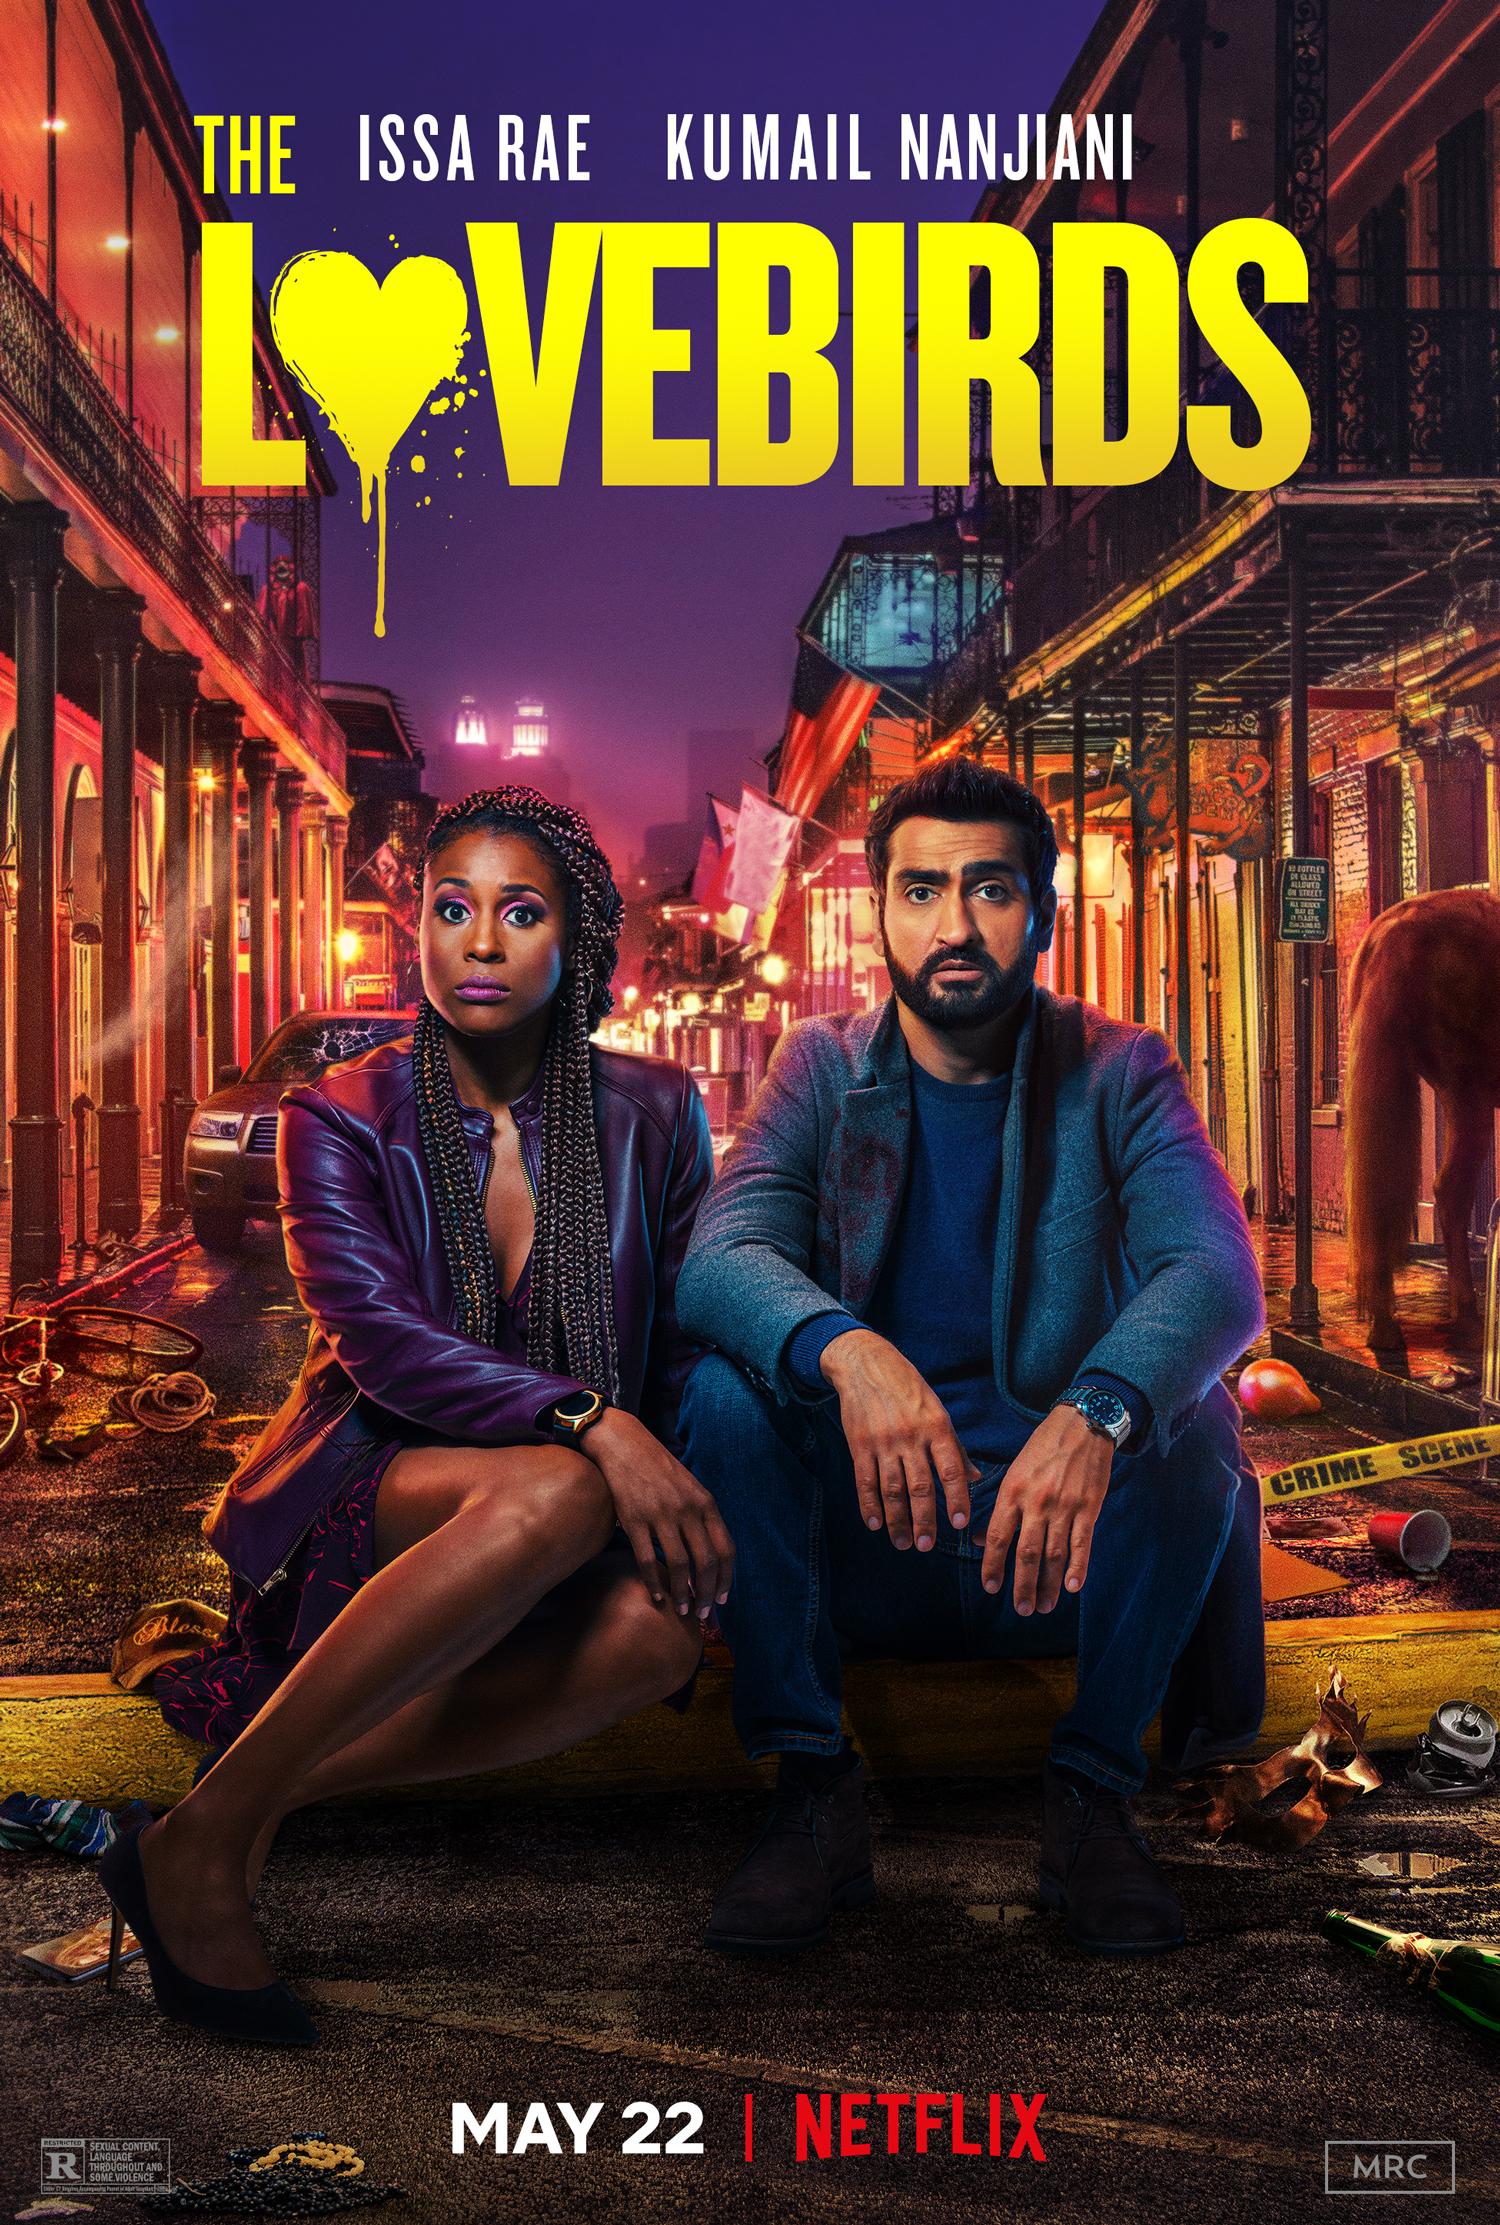 New Movie: Netflix's The Lovebirds Starring Issa Rae & Kumail Nanjiani